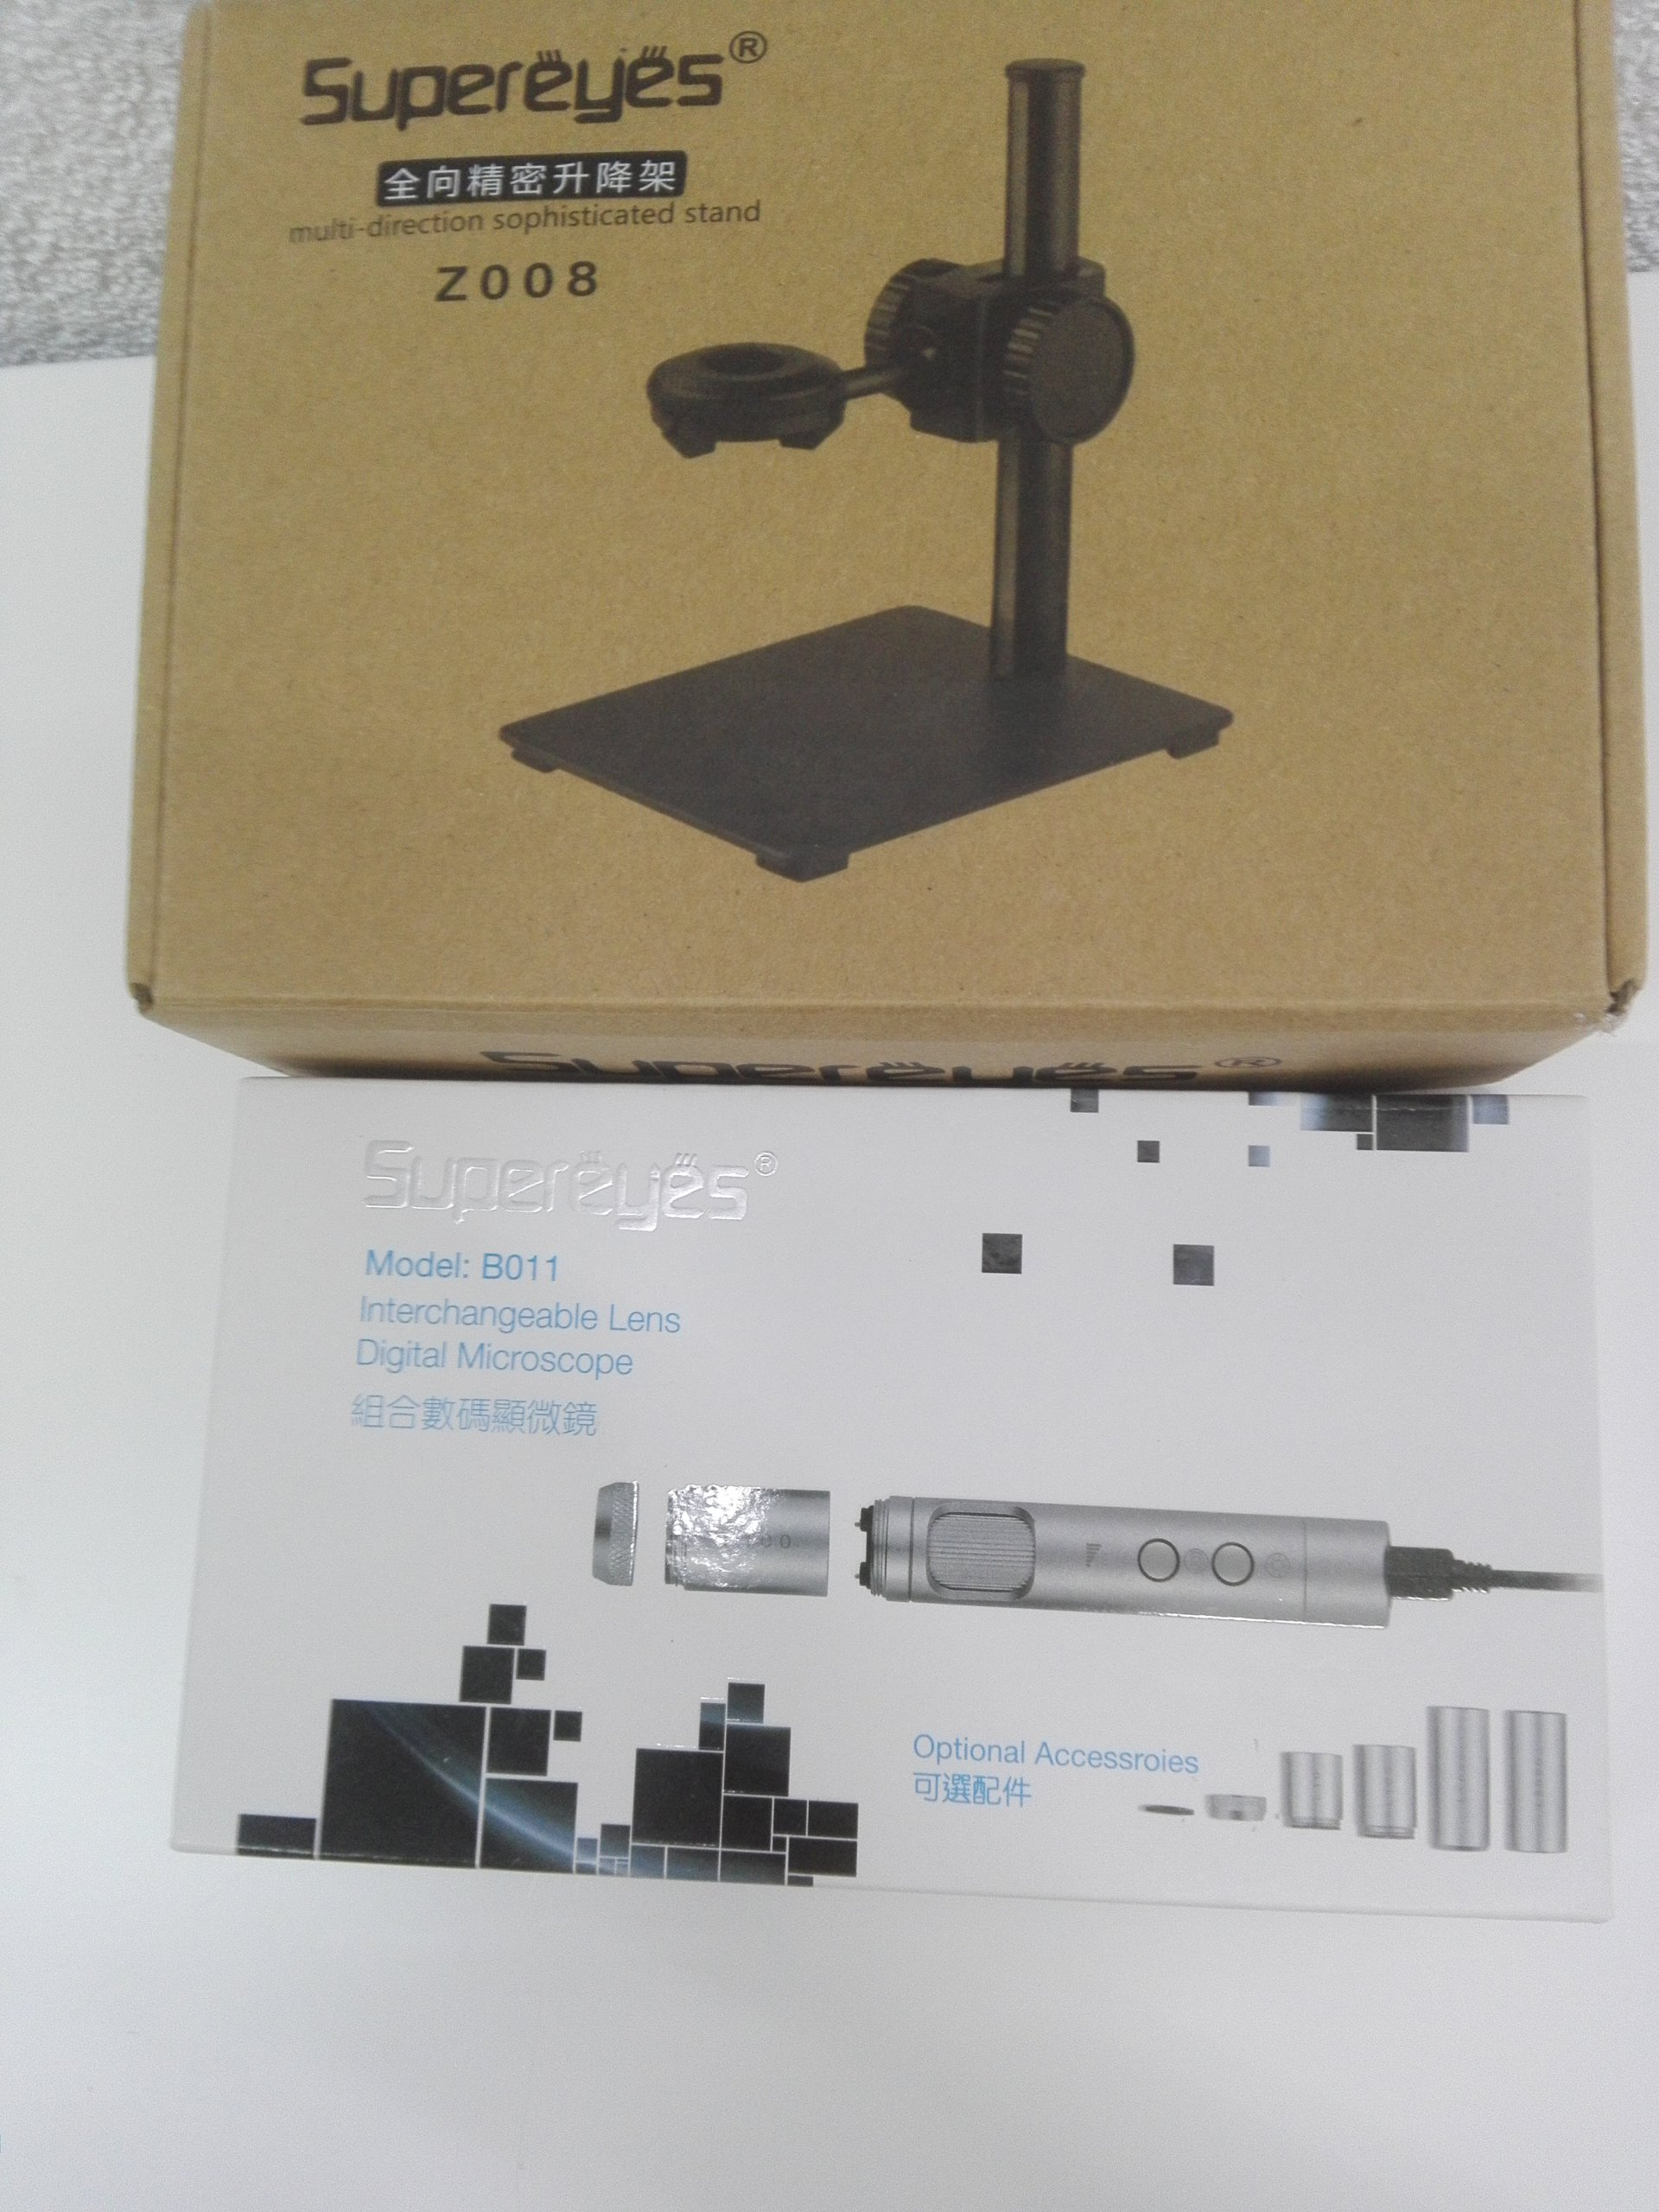 C542 KAMERA Supereyes B011 5,0 MP 1-500 ZOOM USB